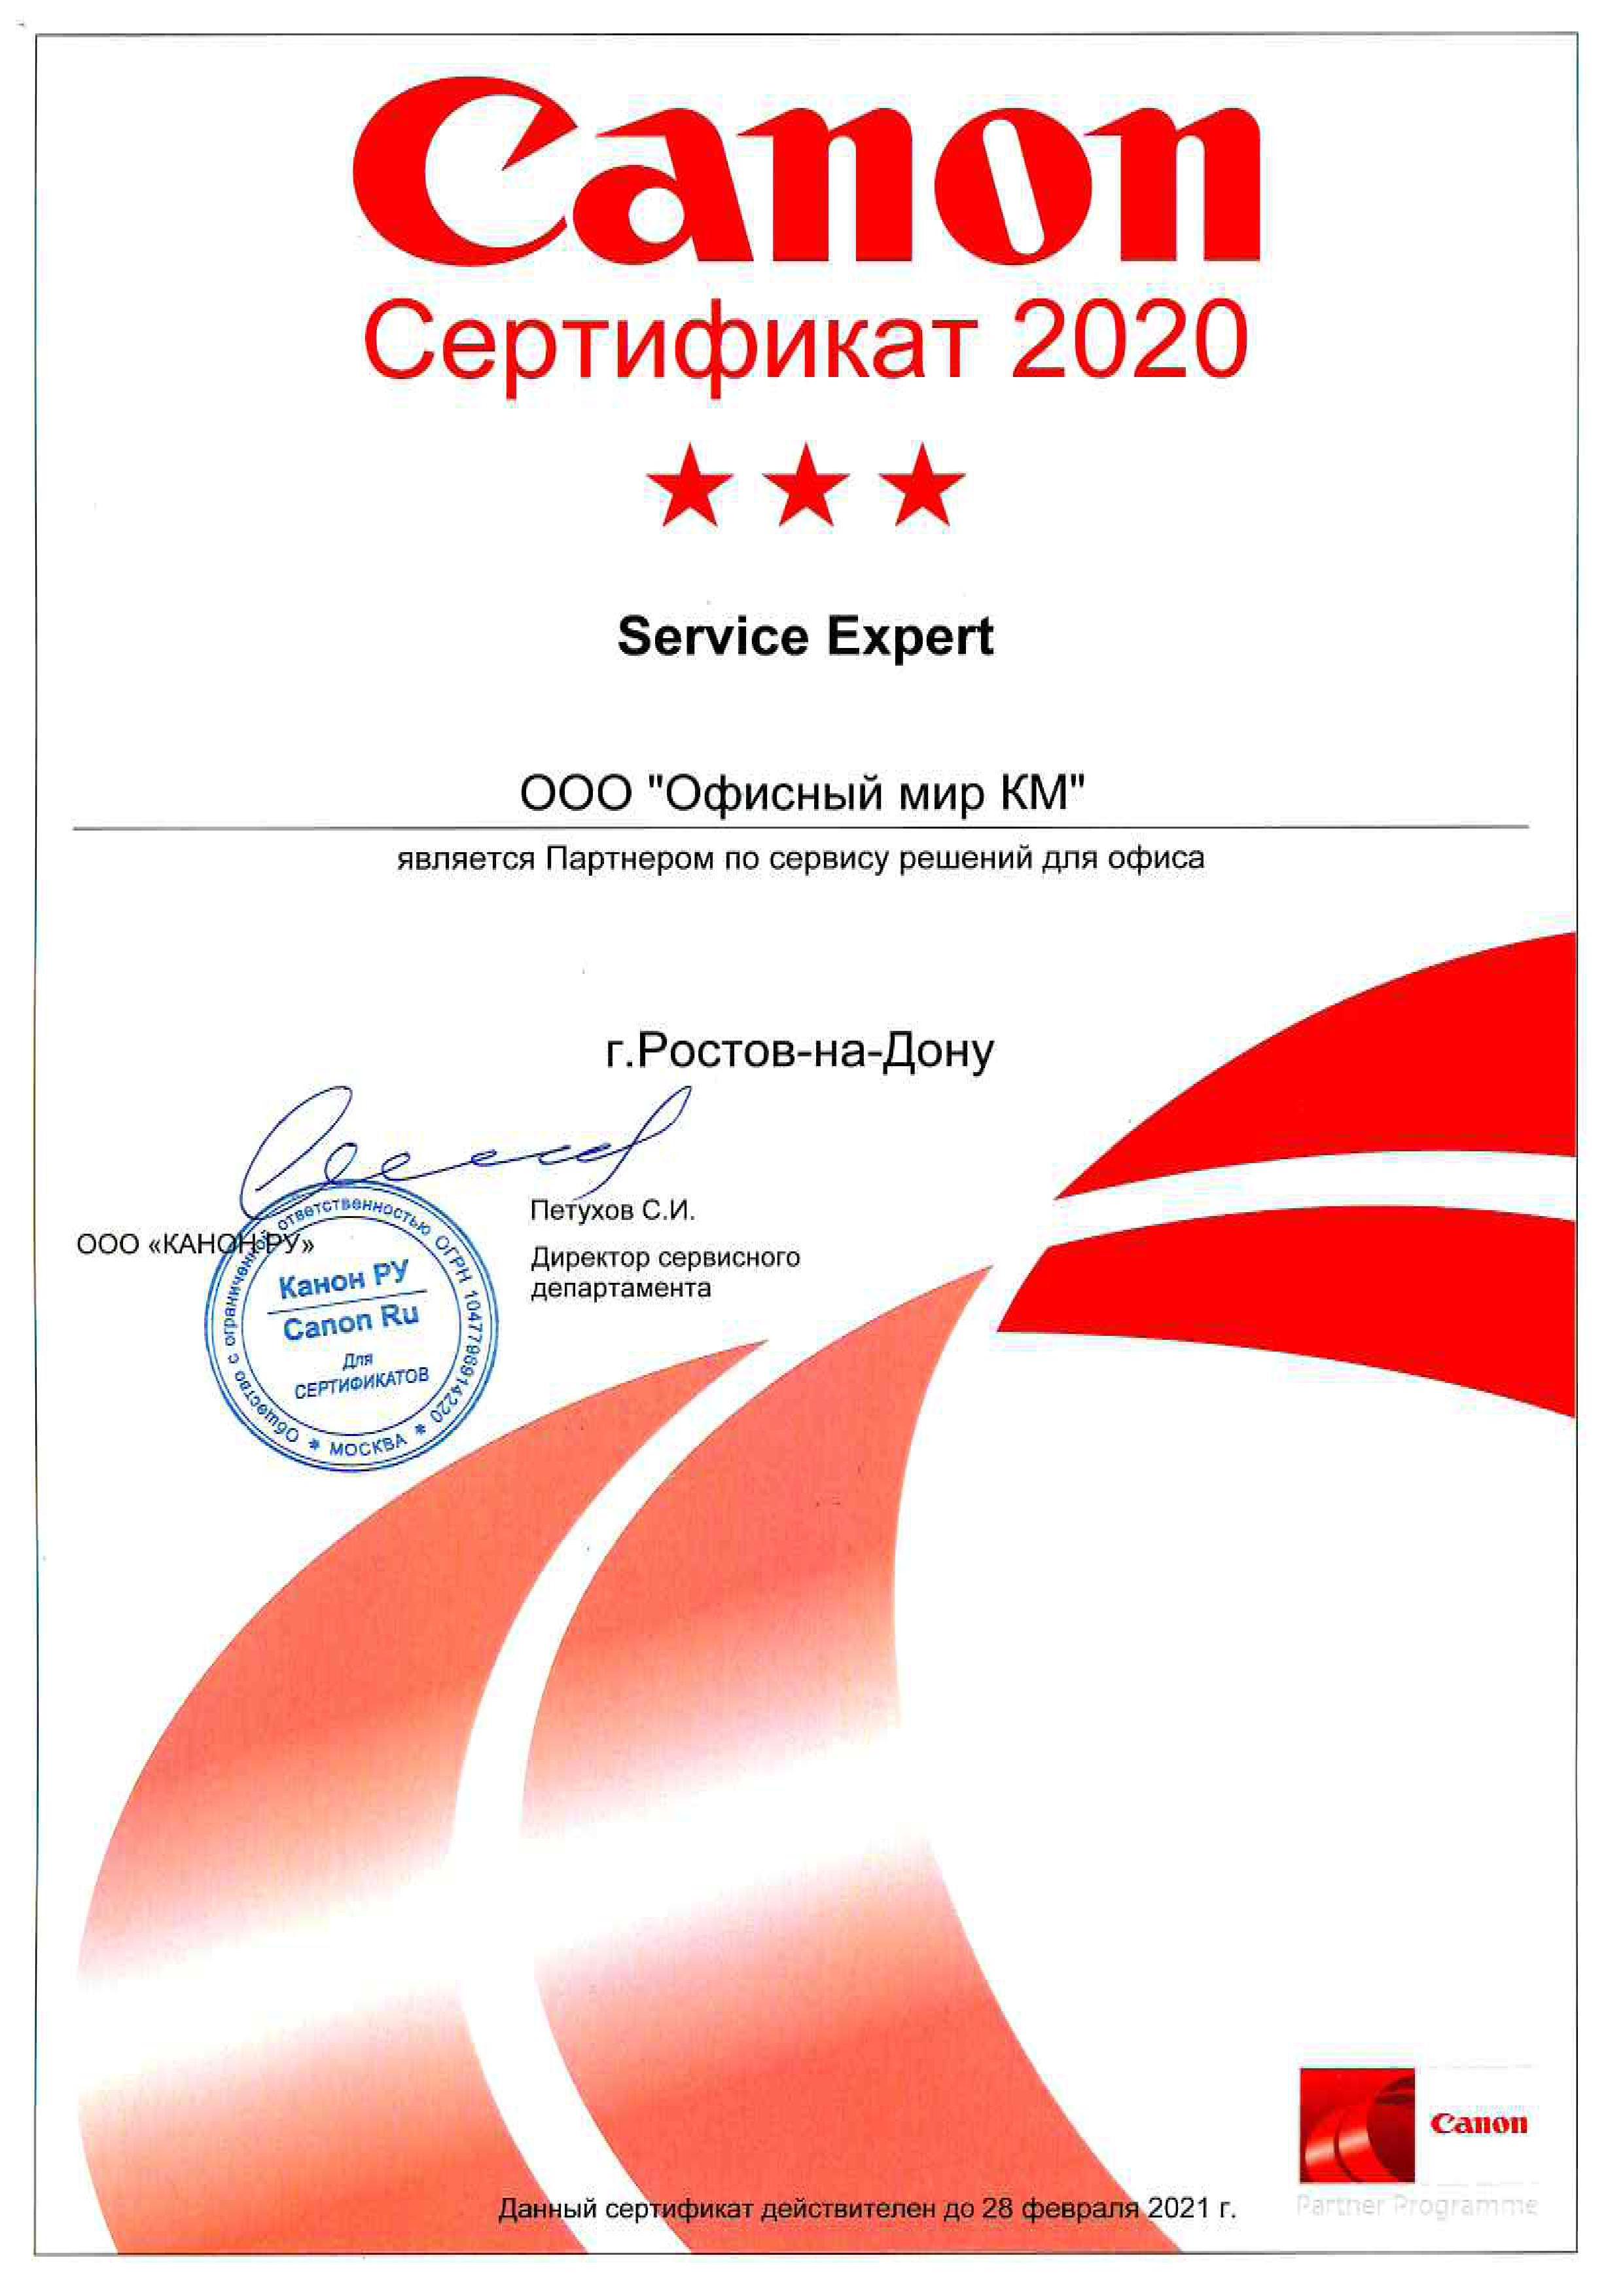 Canon Service Expert 2020